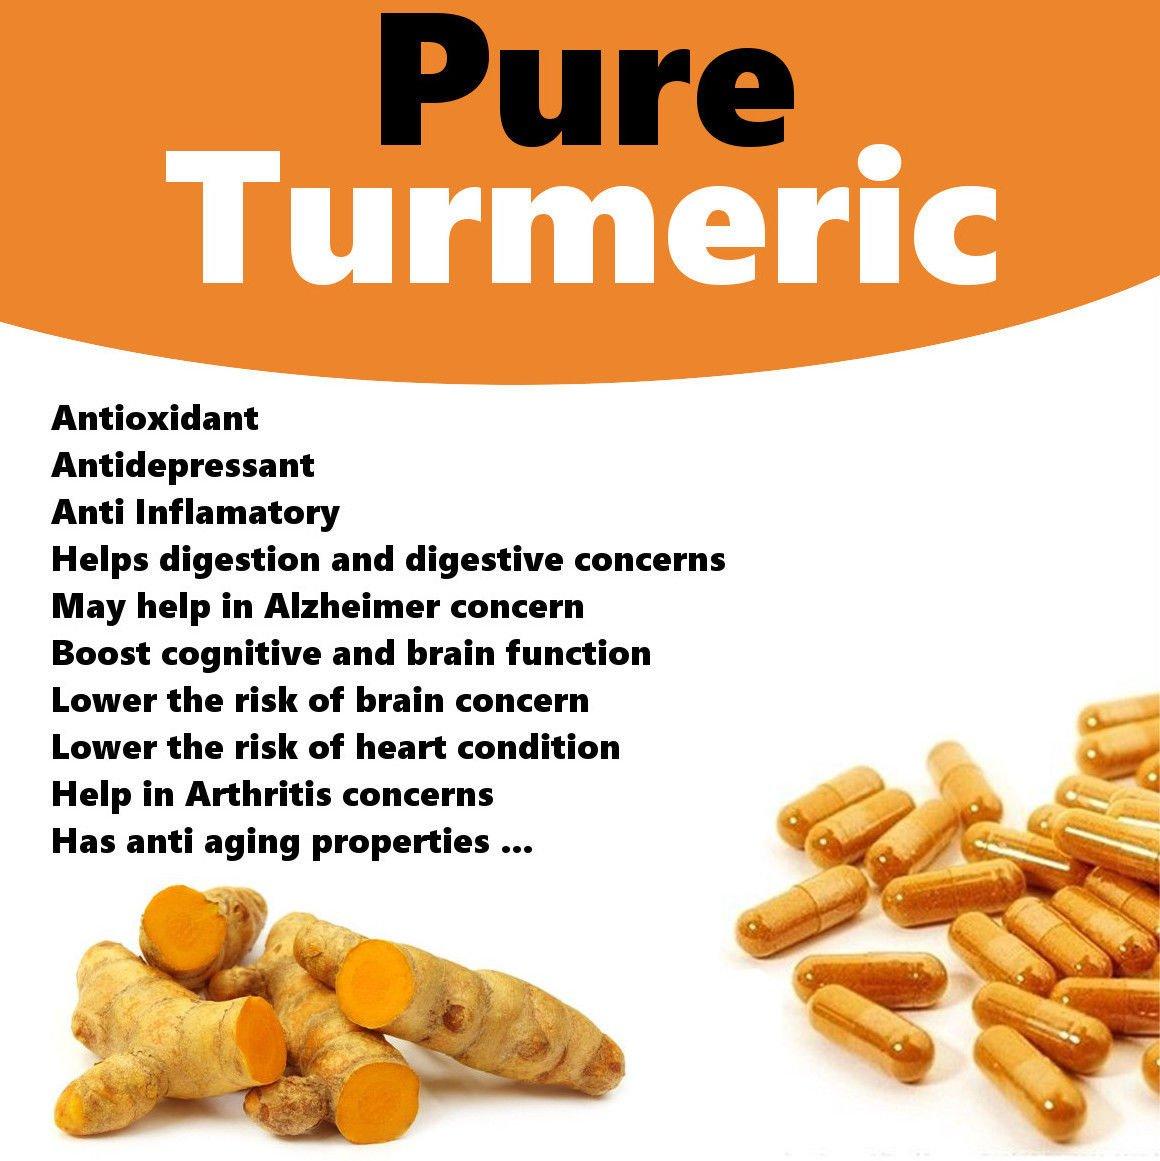 Organic Turmeric Powder (Curcumin) Premium Grade, High Purity, Freshly Packed Gluten-Free Vegan USDA ORGANIC 2 lbs